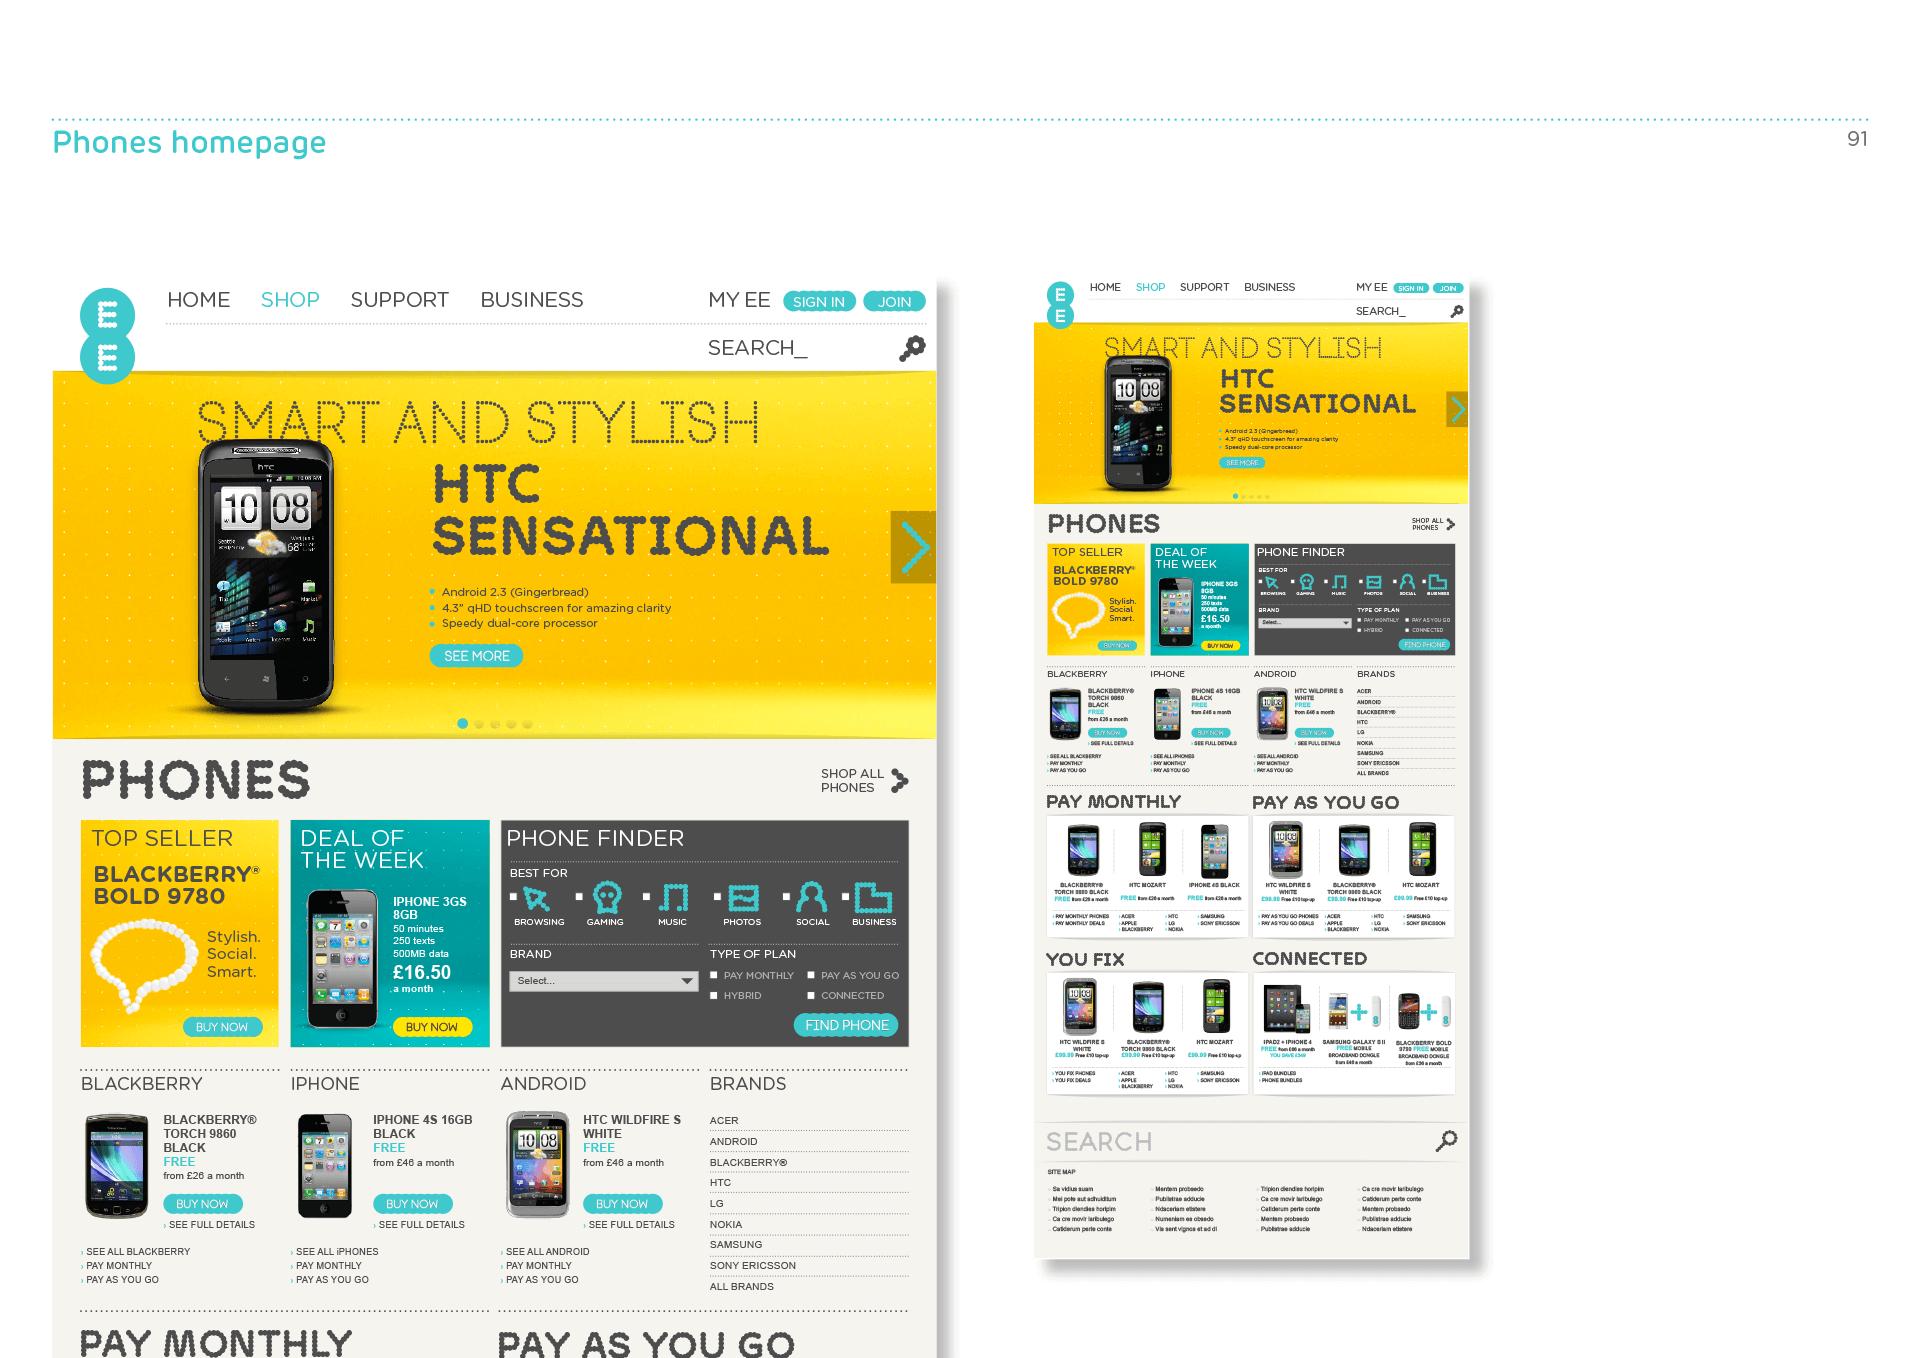 EE site design